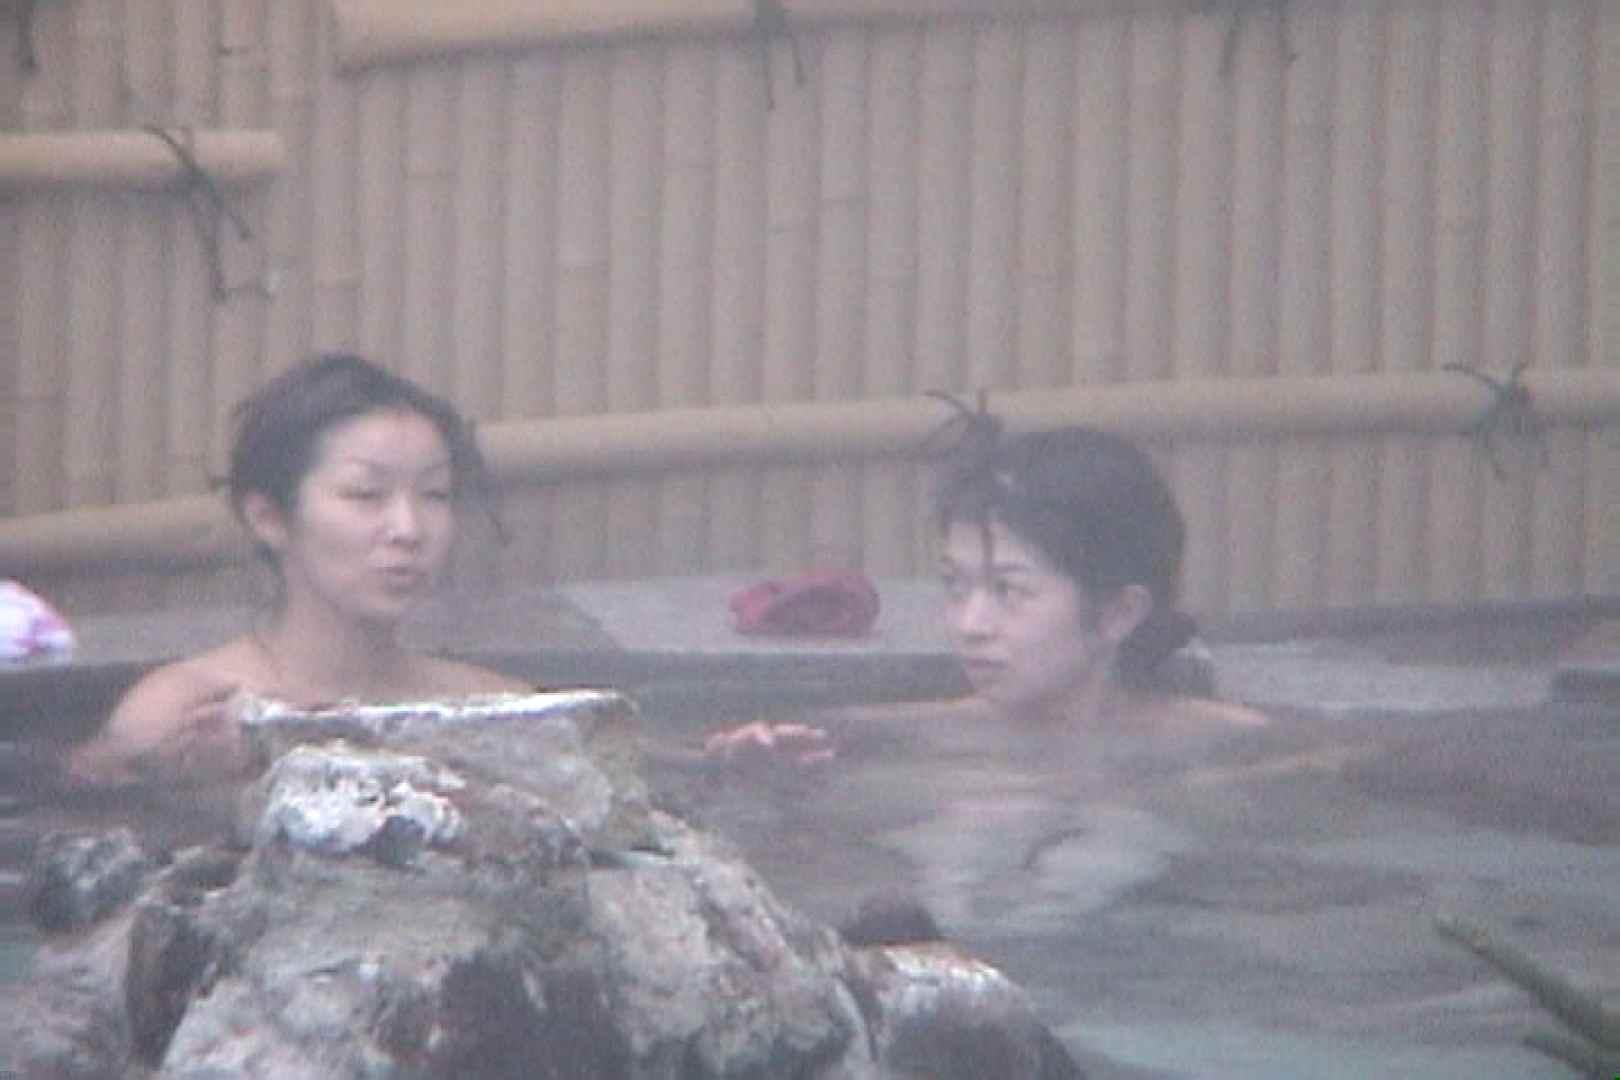 Aquaな露天風呂Vol.82【VIP限定】 露天風呂 | OLのエロ生活  51連発 1